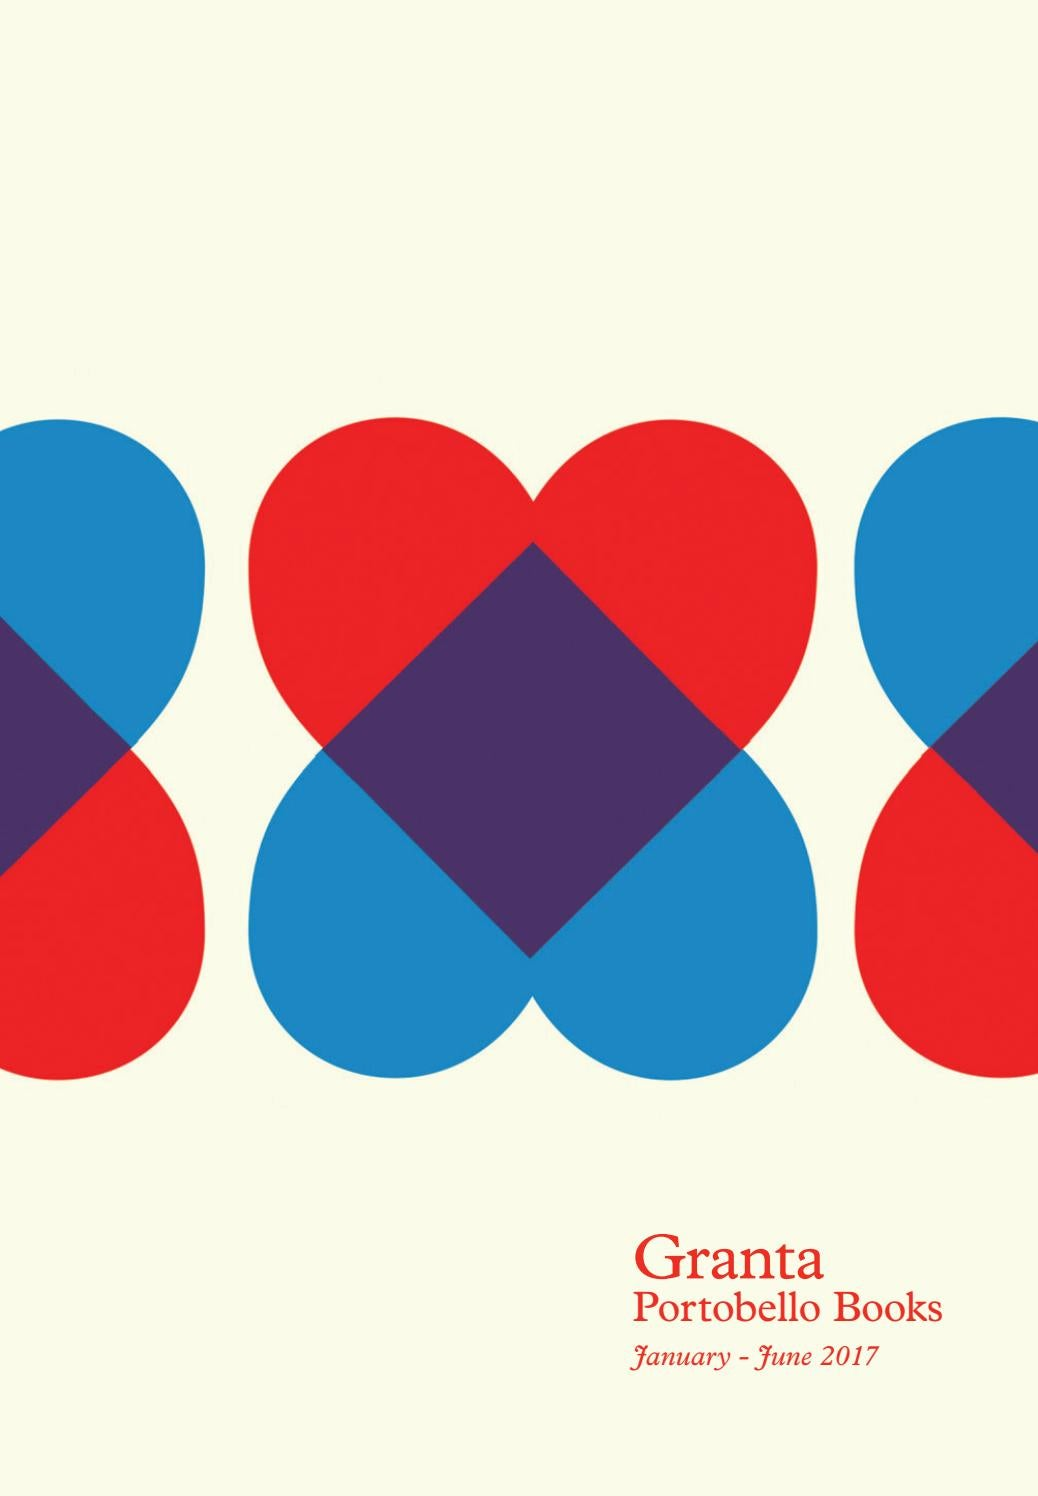 Granta publications catalogue january to june 2017 by granta granta publications catalogue january to june 2017 by granta publications issuu fandeluxe Gallery